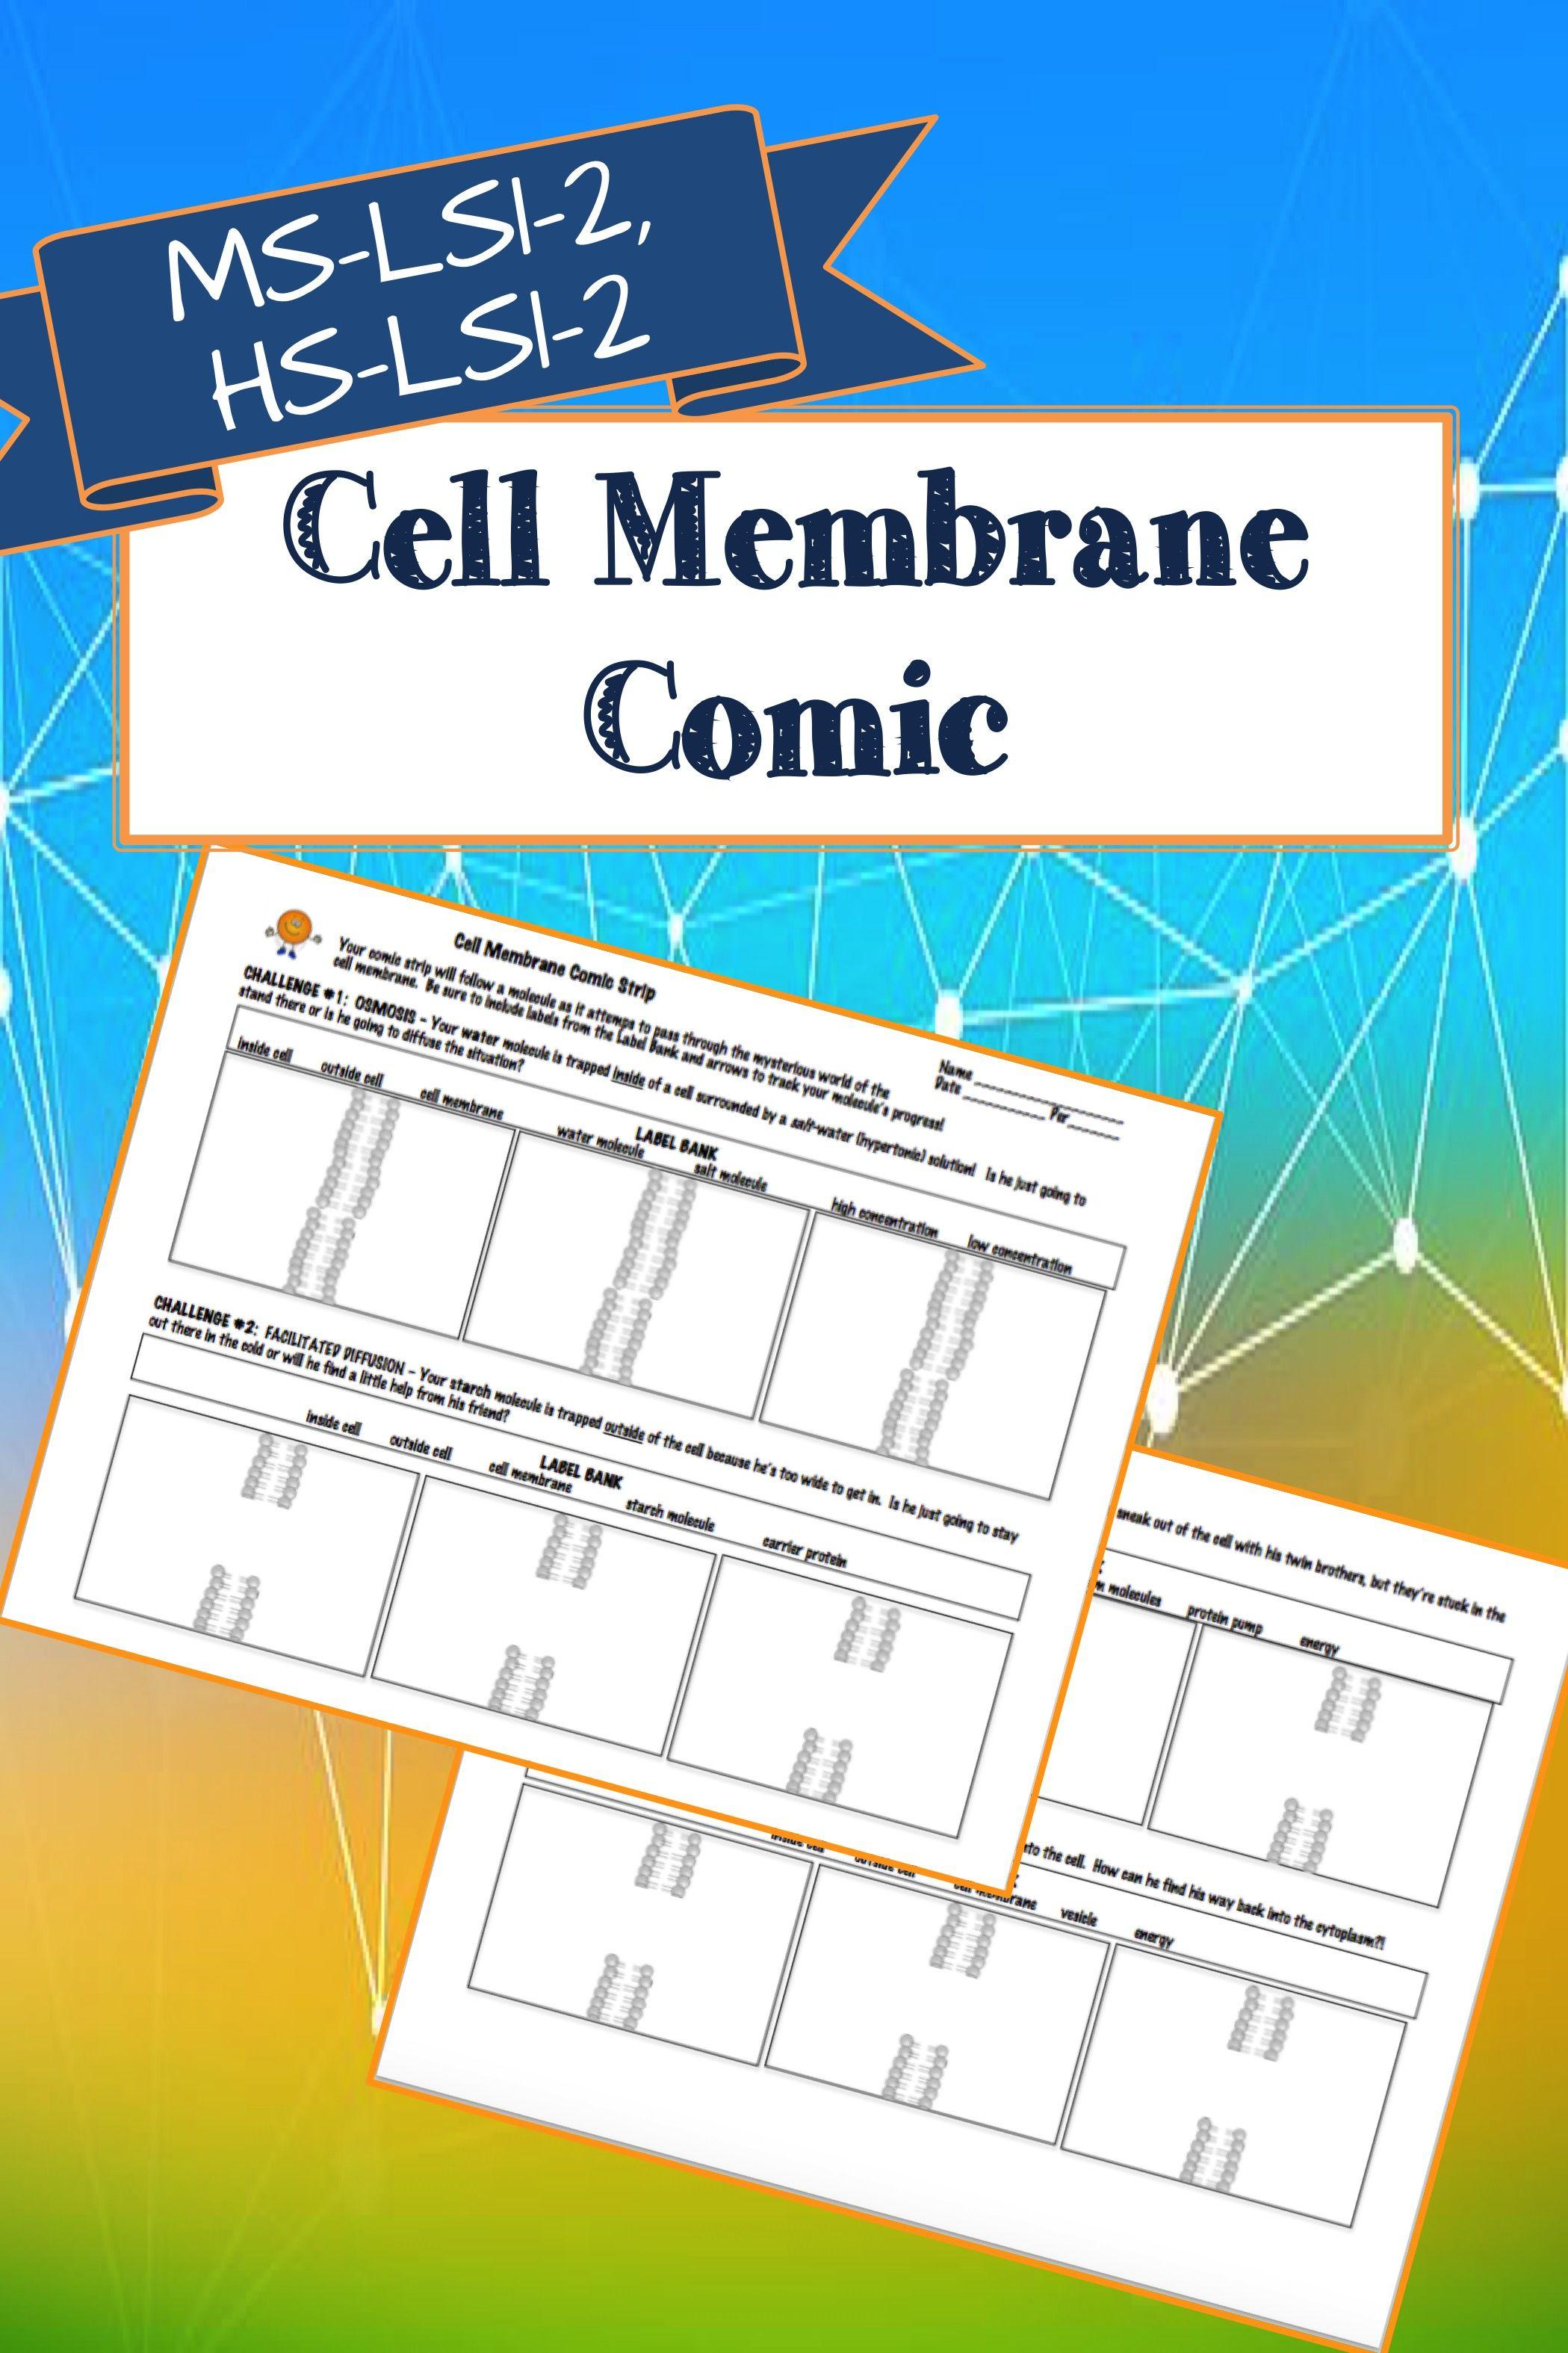 Cell Membrane Comic Ngss Ms Ls1 2 Hs Ls1 2 Cell Membrane Cells Lesson Membrane [ 3149 x 2099 Pixel ]